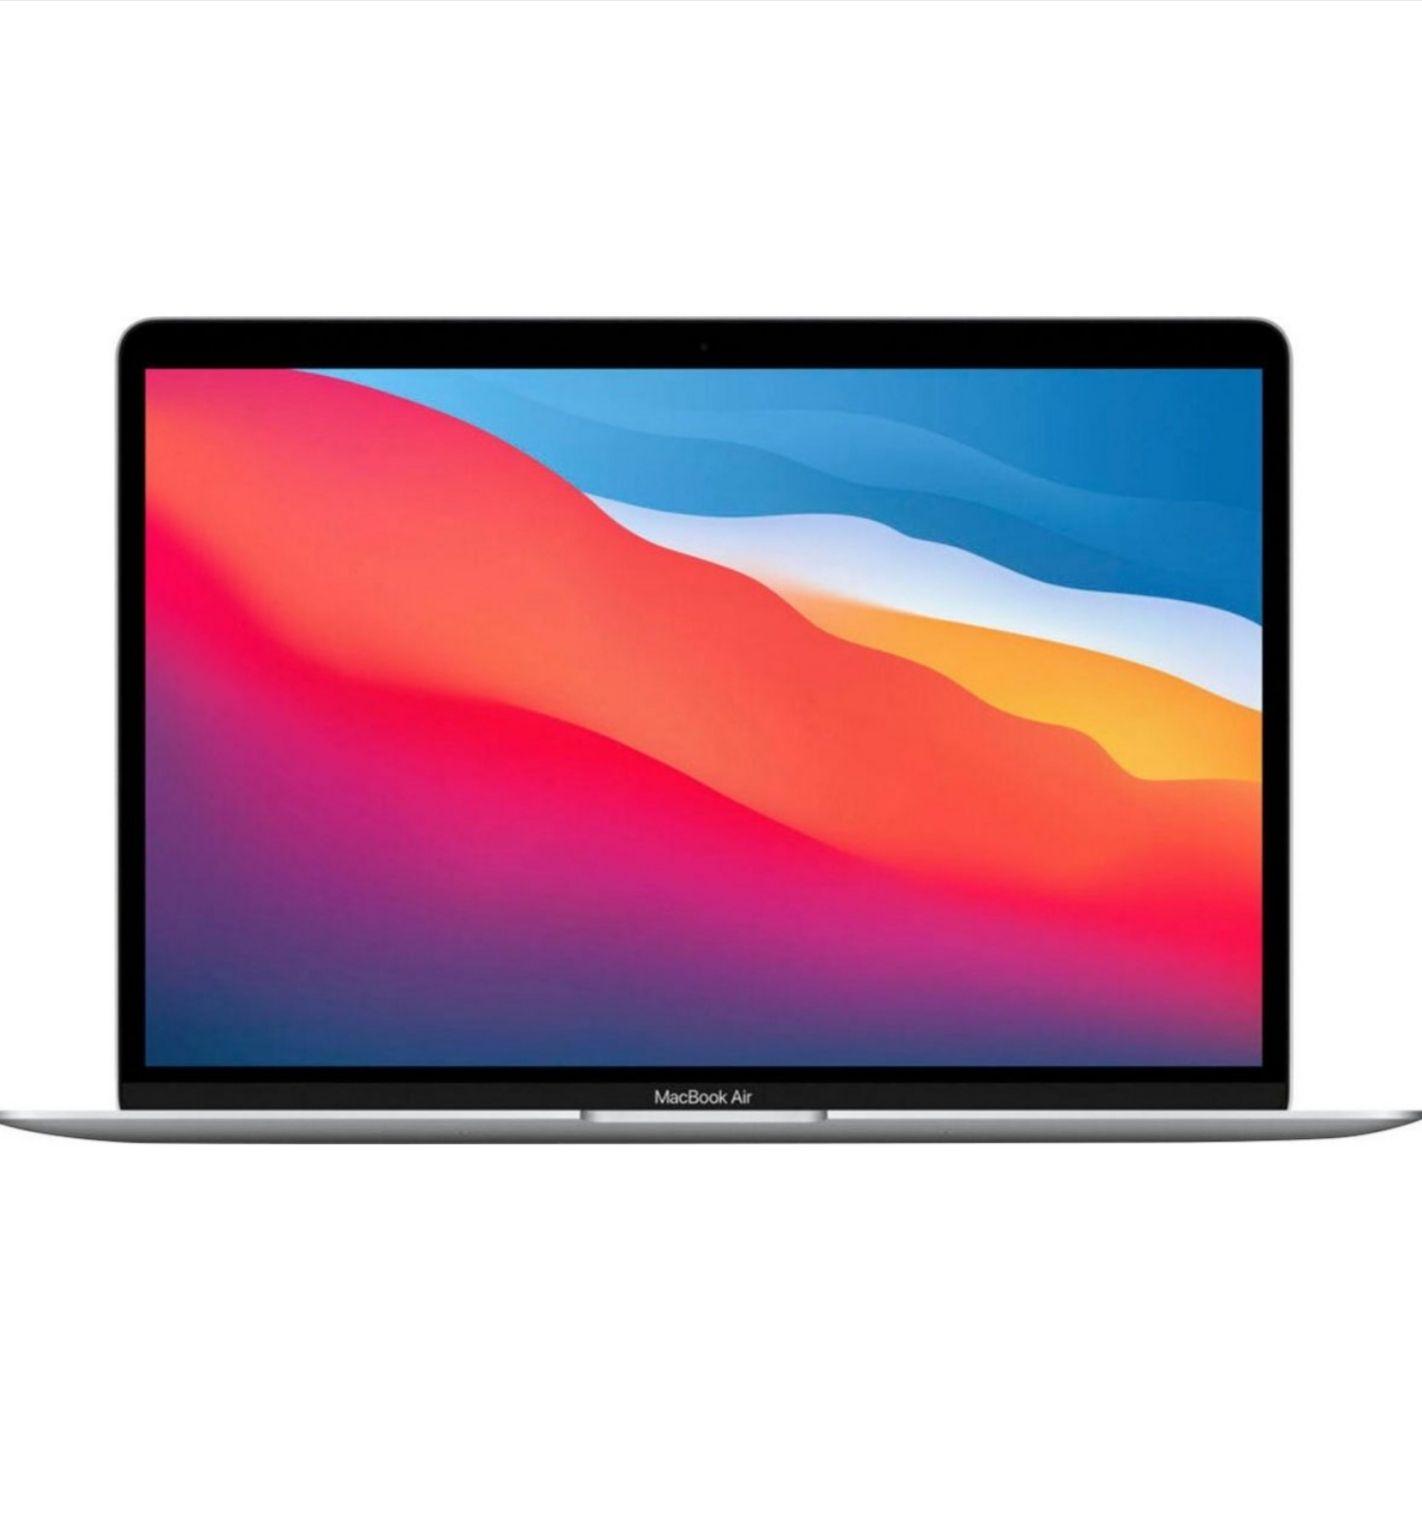 Apple MacBook Air M1 (13,3 Zoll, 8GB Ram, 512 GB SSD)(1205,55€ möglich)